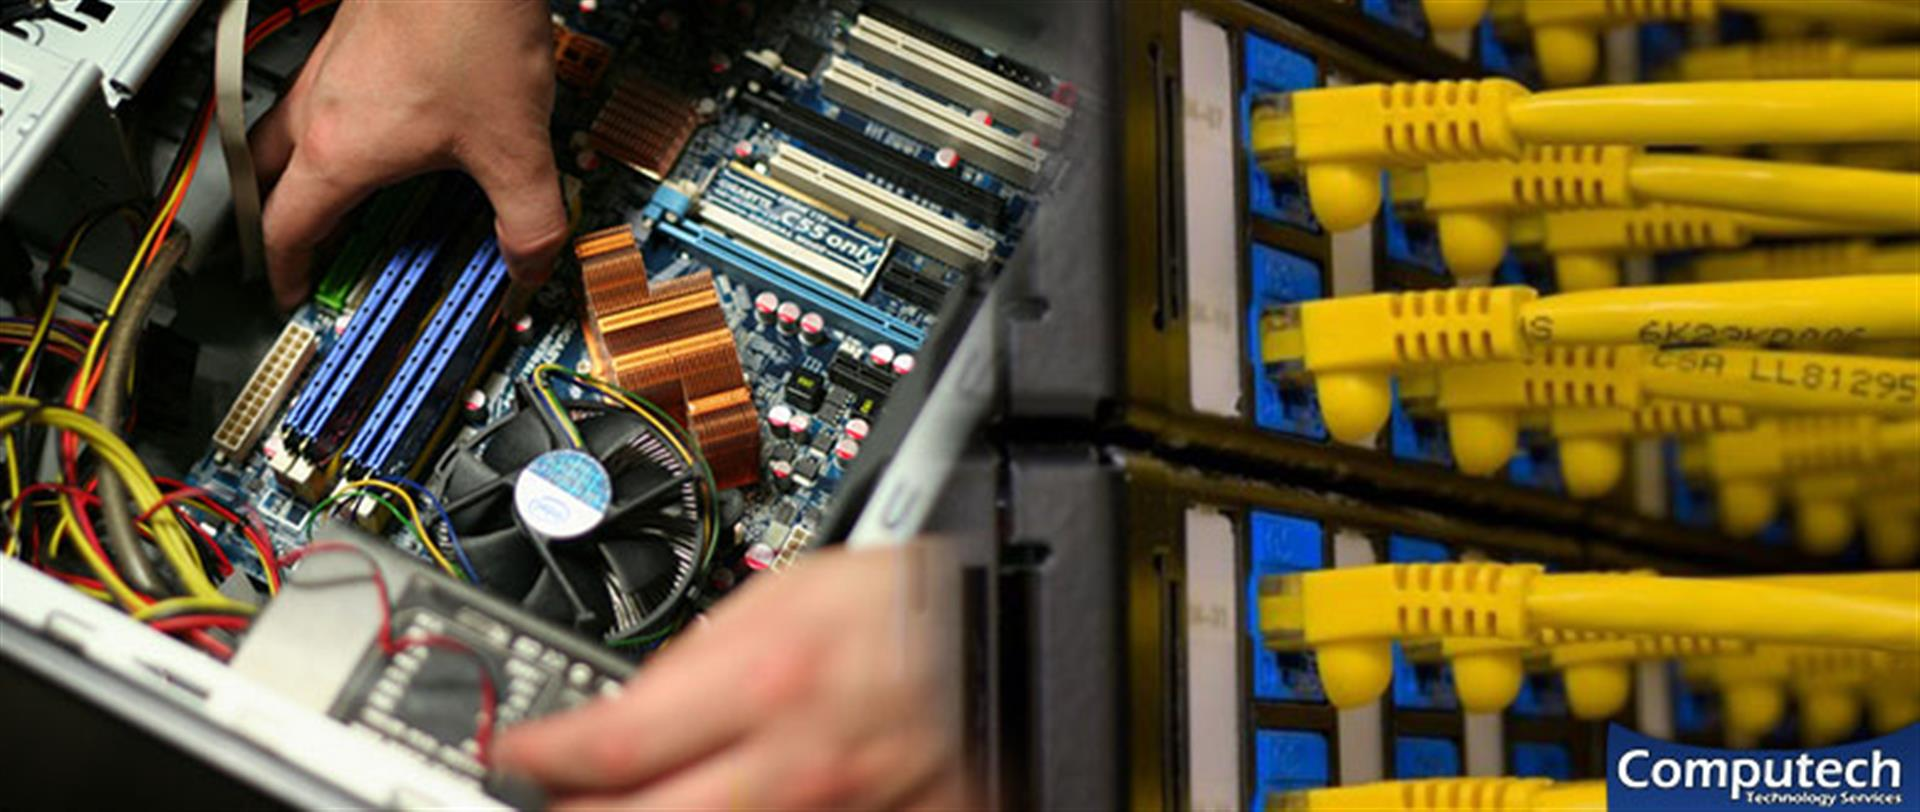 Jasper Georgia Onsite PC & Printer Repairs, Network, Voice & Data Cabling Services